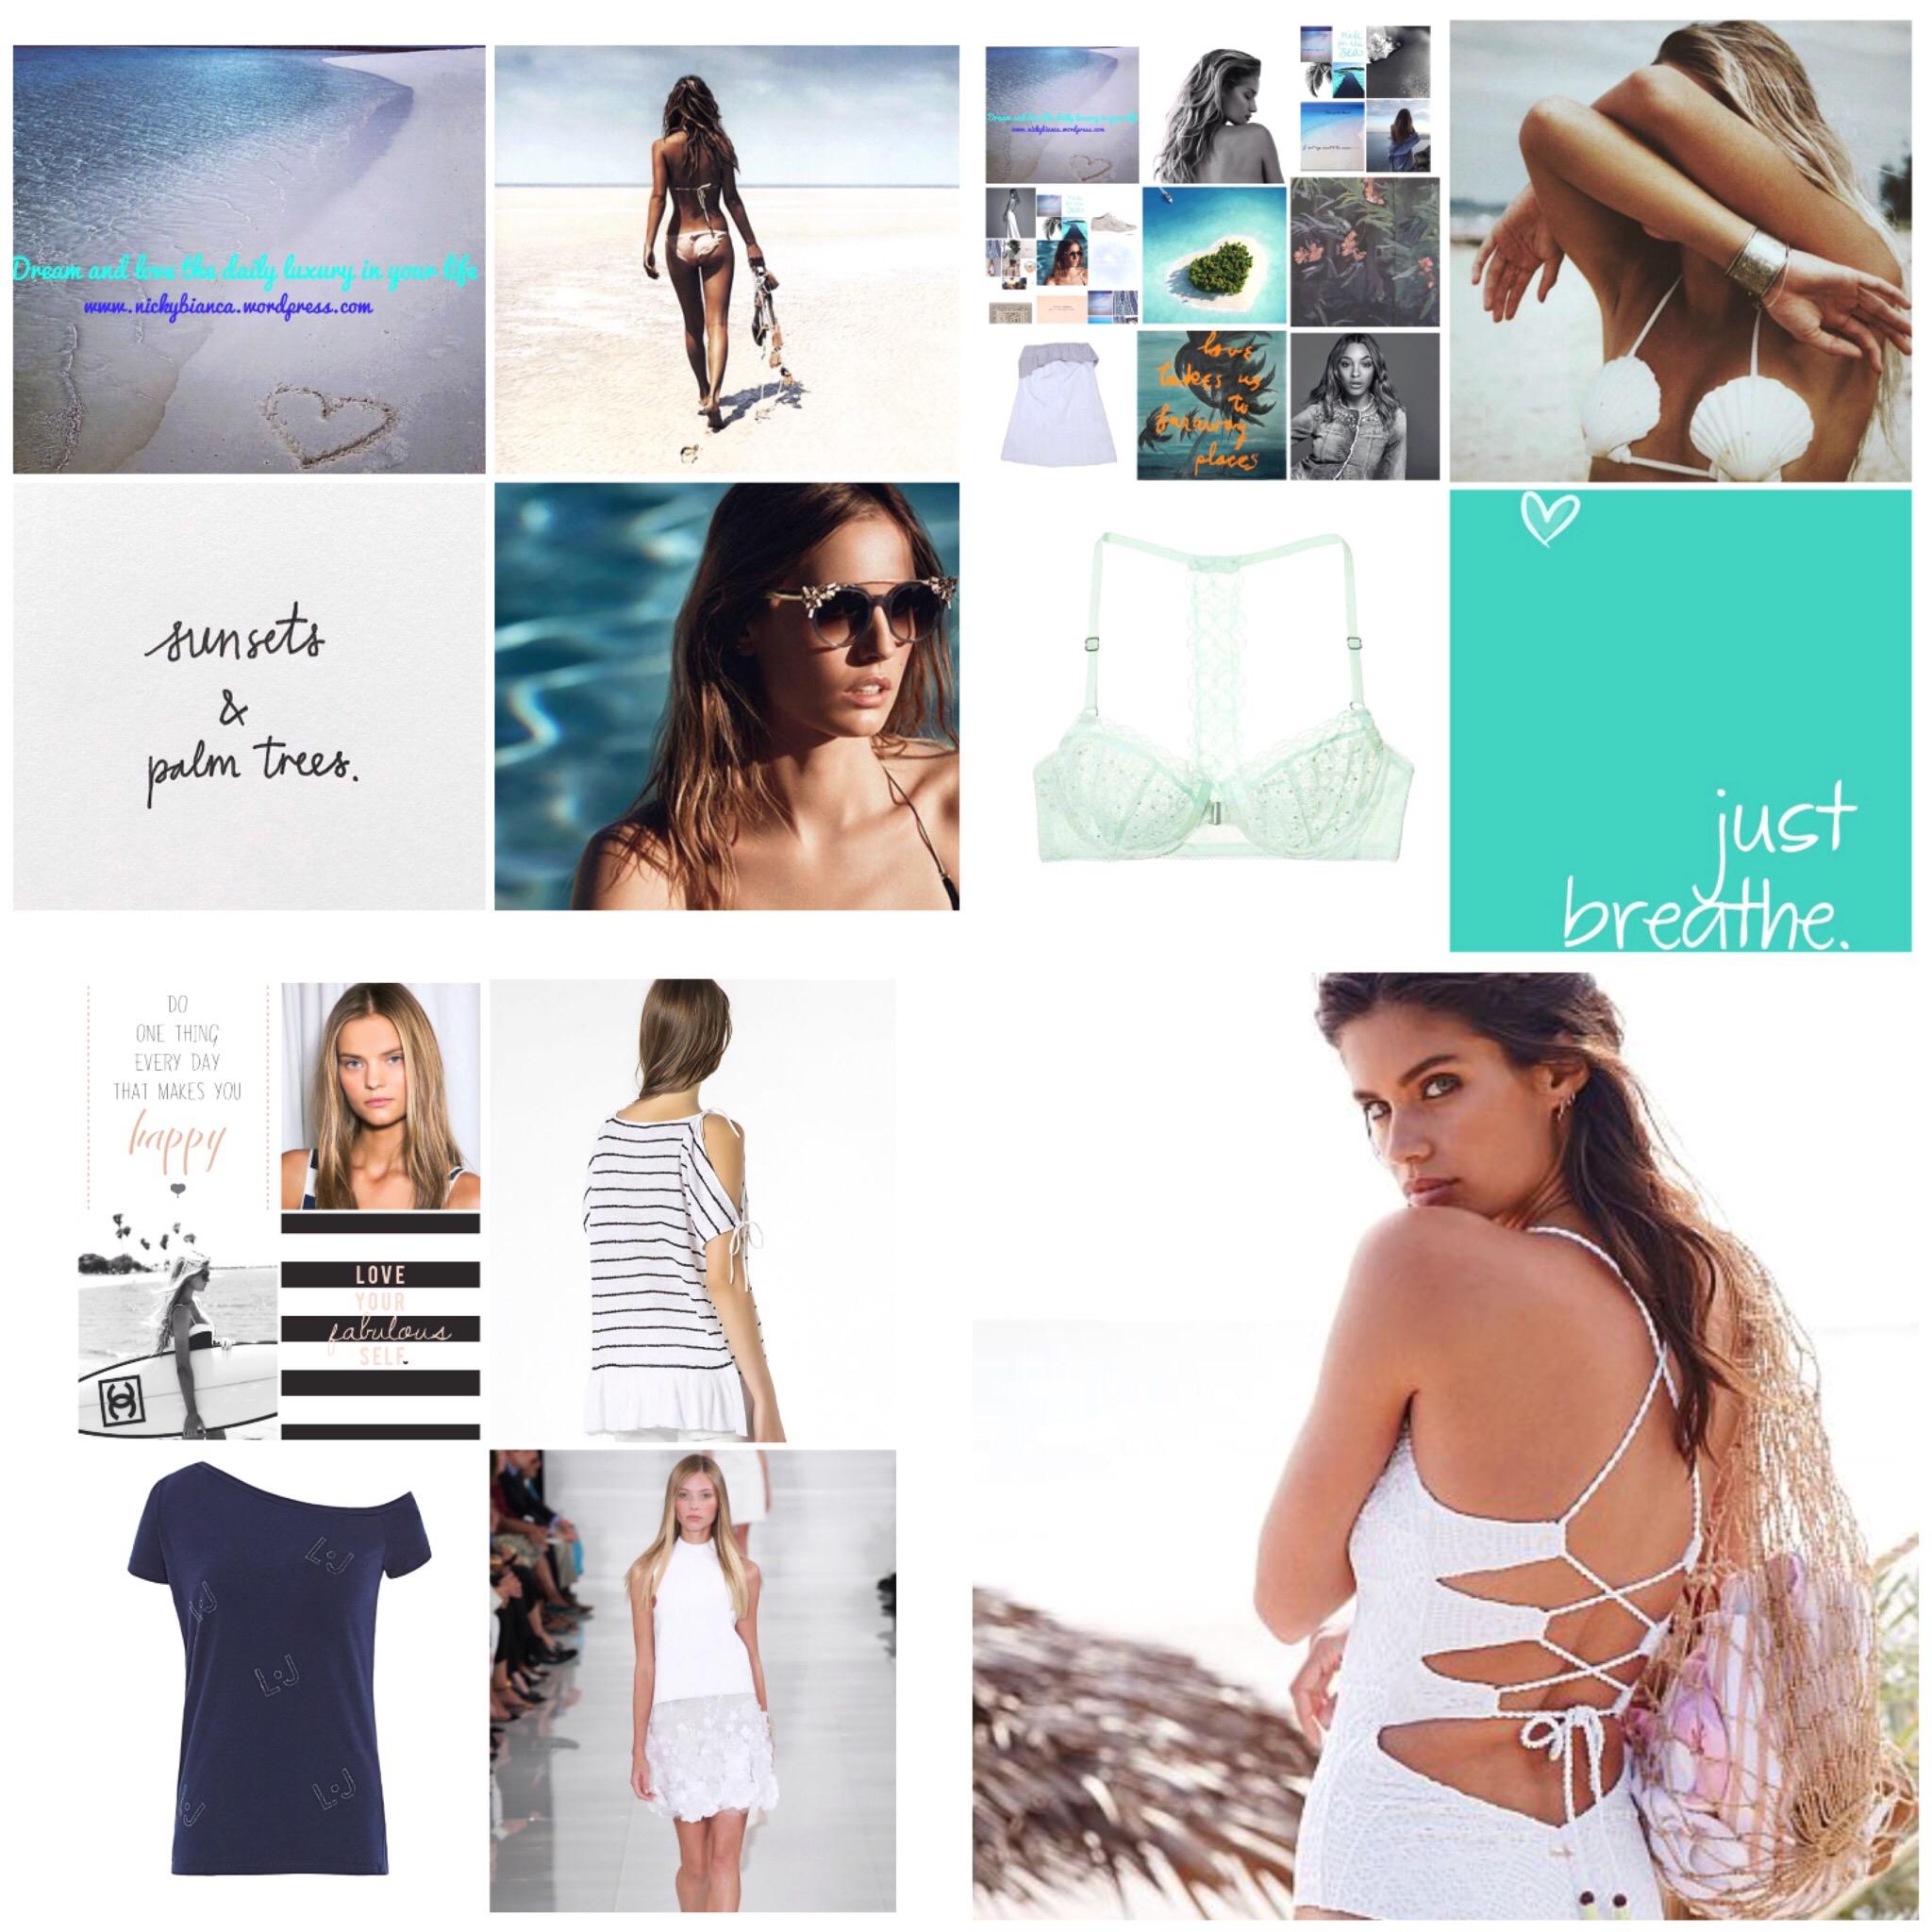 Summer love 💙